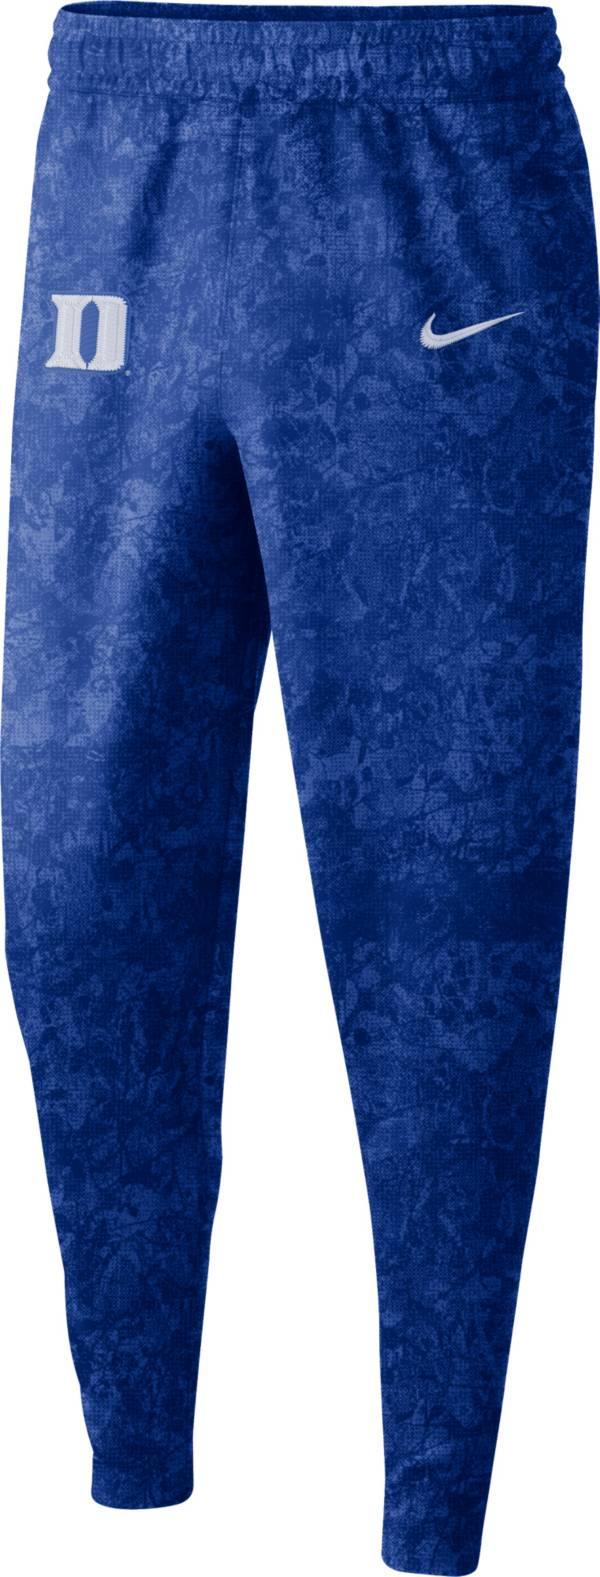 Nike Men's Duke Blue Devils Duke Blue Dri-FIT Spotlight Basketball Fleece Pants product image